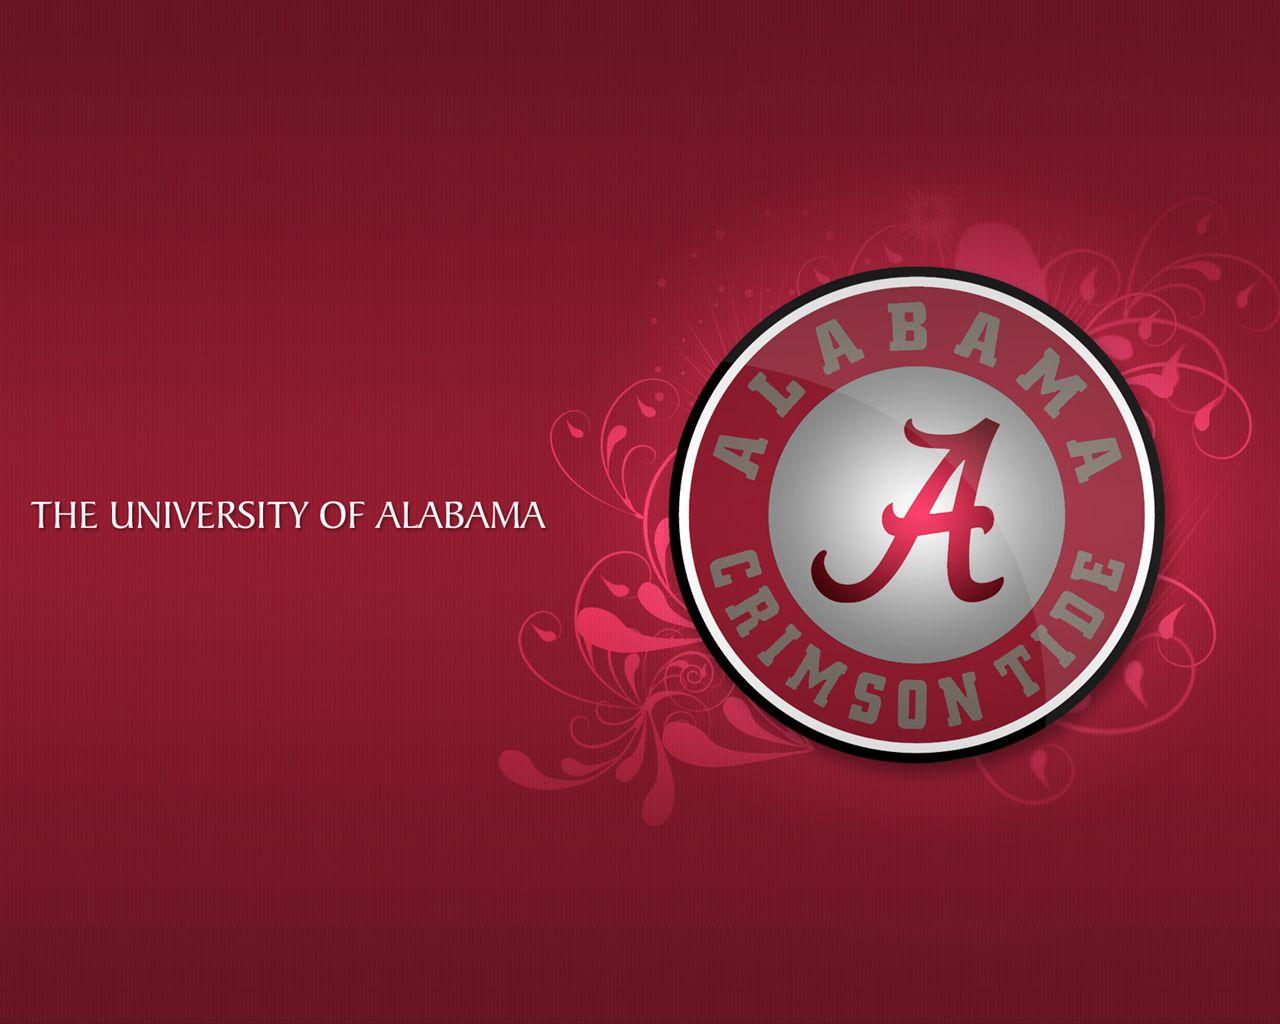 University Of Alabama Wallpaper Alabama Football Pictures Alabama Alabama Football